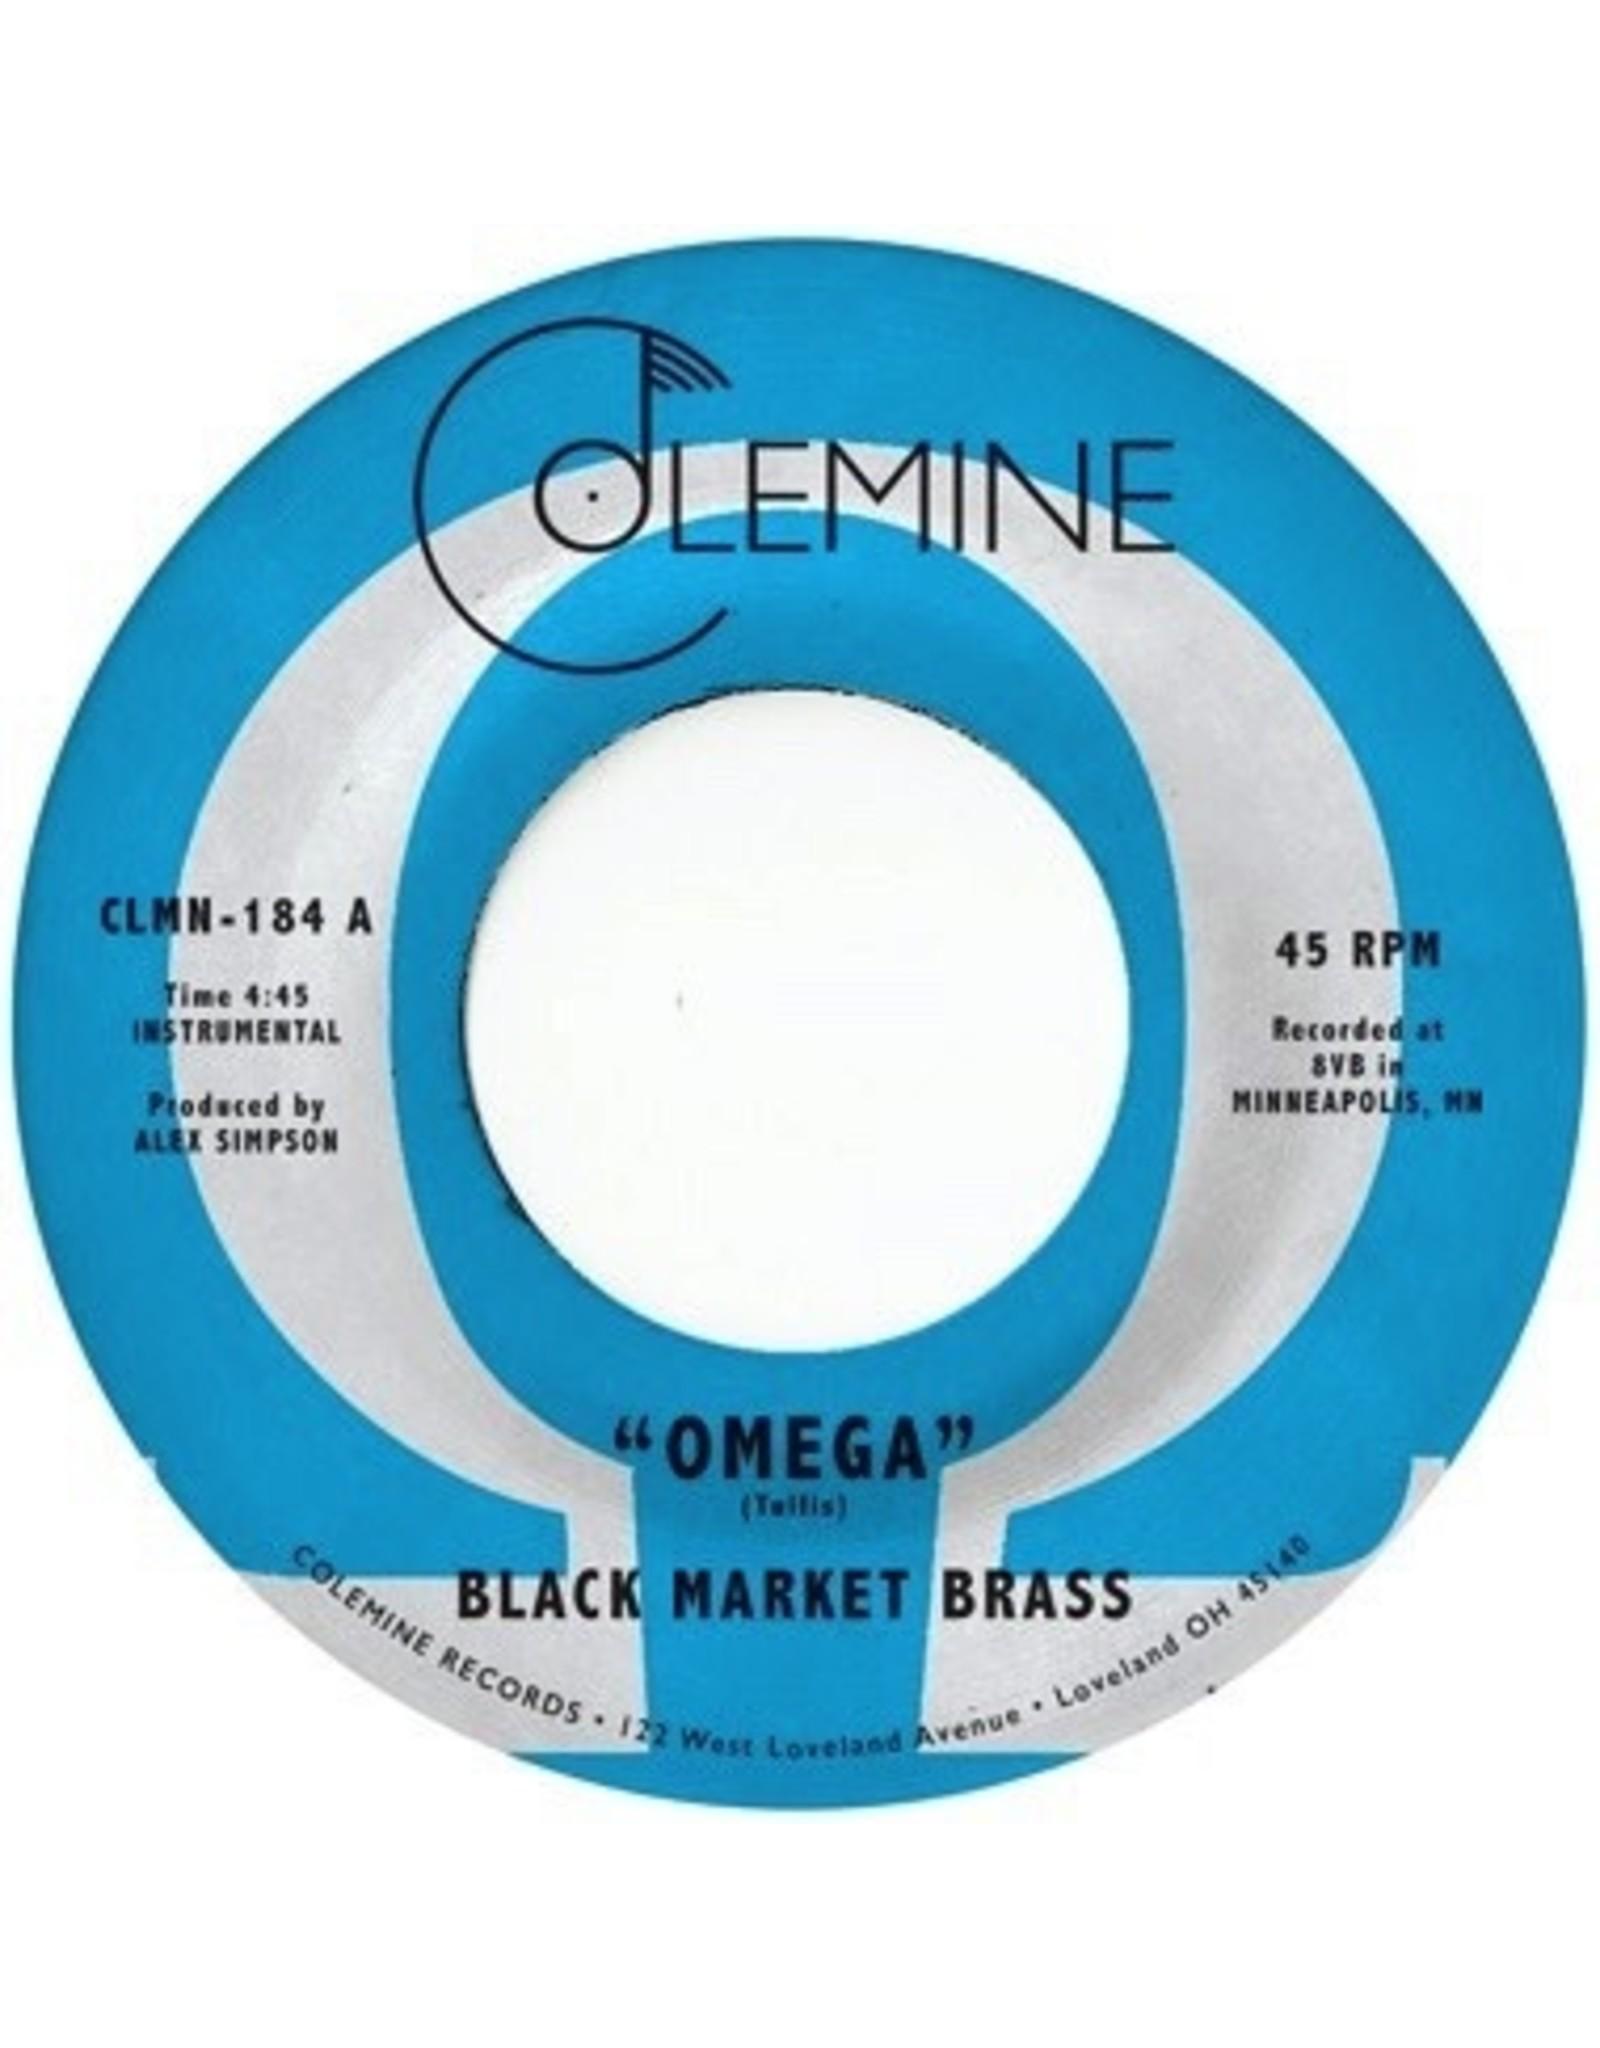 "New Vinyl Black Market Brass - Omega (Colored) 7"""